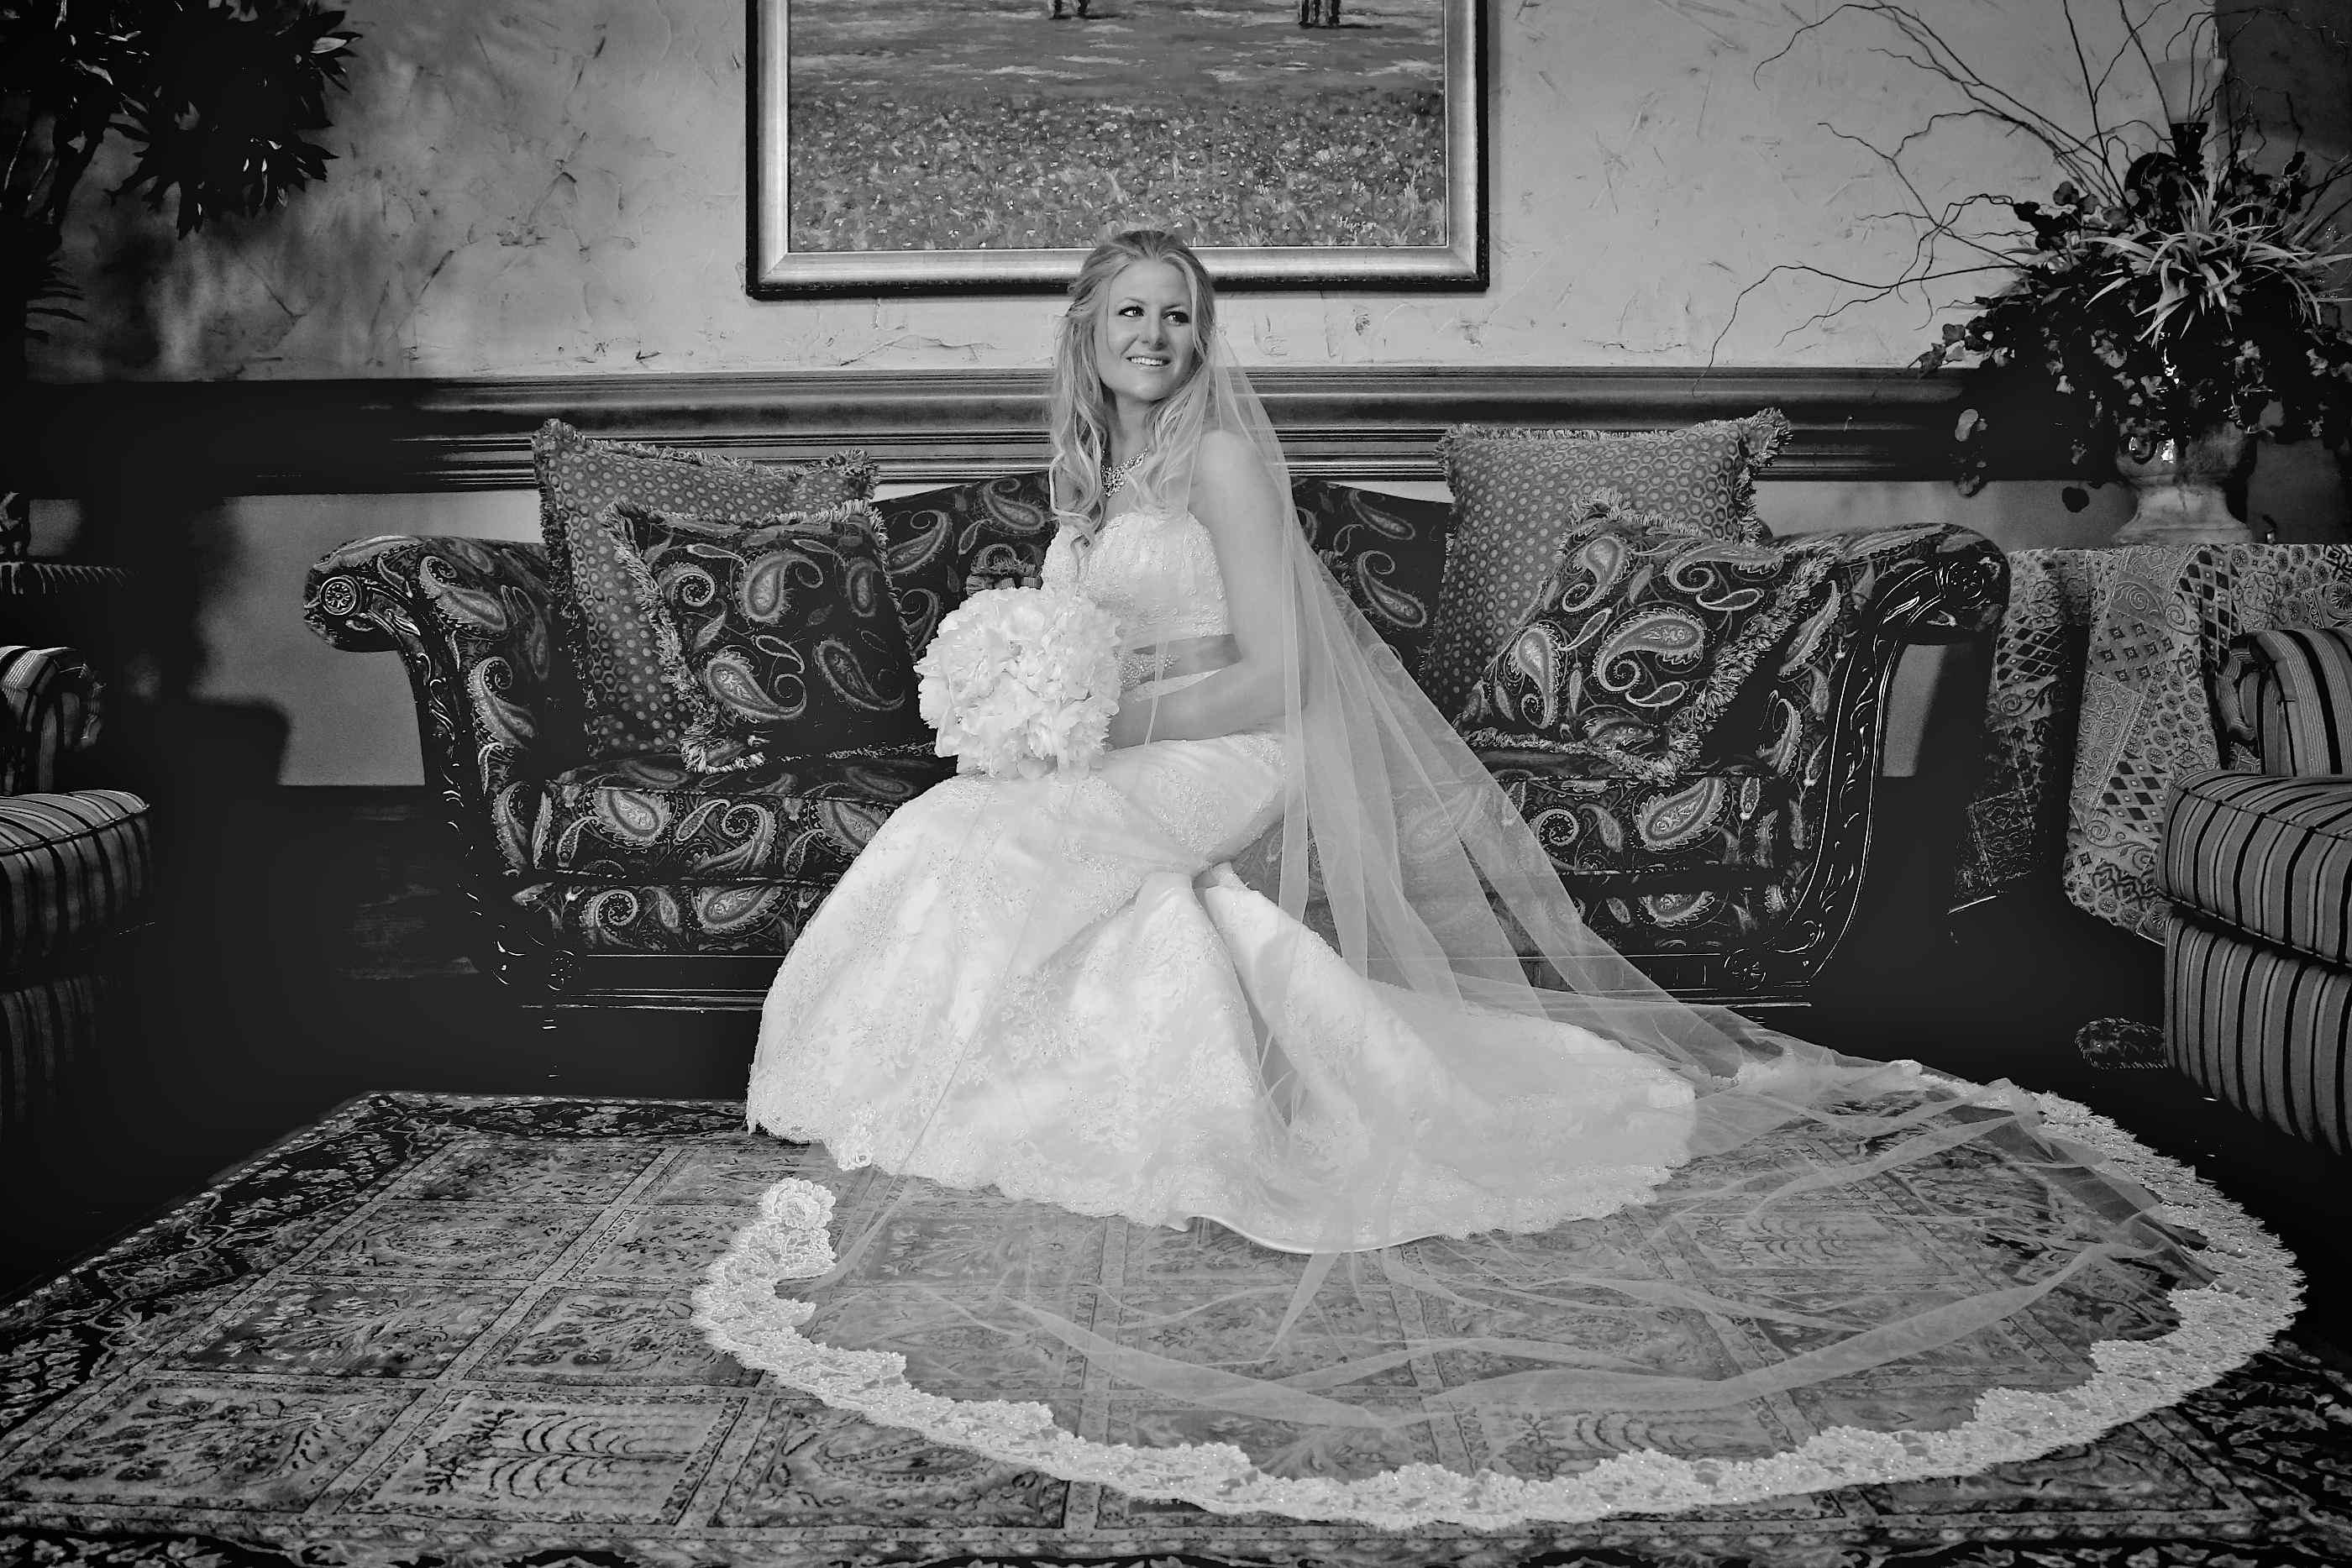 top-10-bride-photos-2013-003